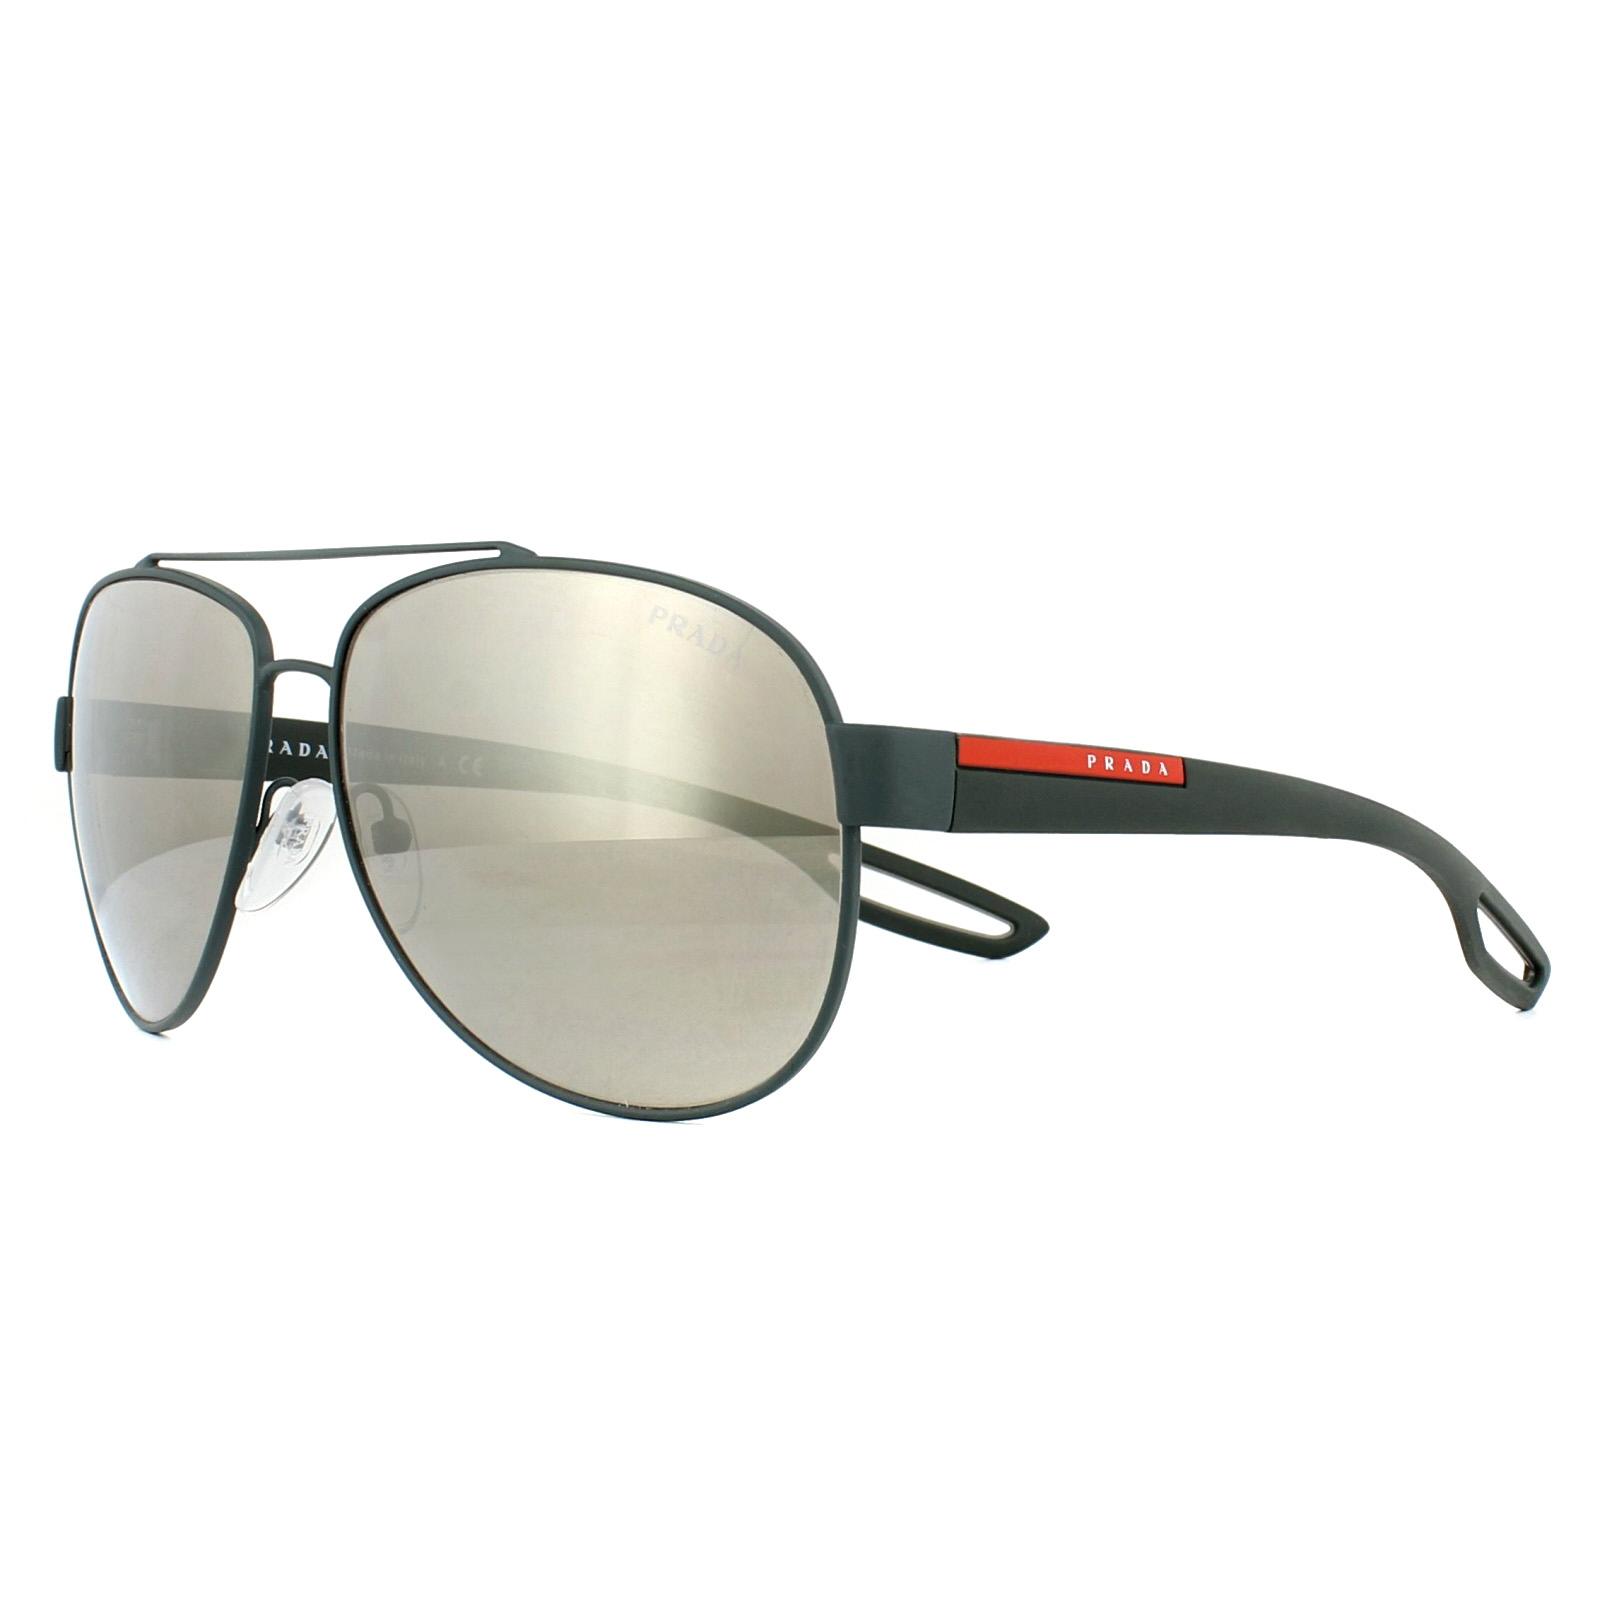 757f2eedfa CENTINELA Prada Sport gafas de sol 55QS UFI1C0 caucho verde marrón espejo  62mm